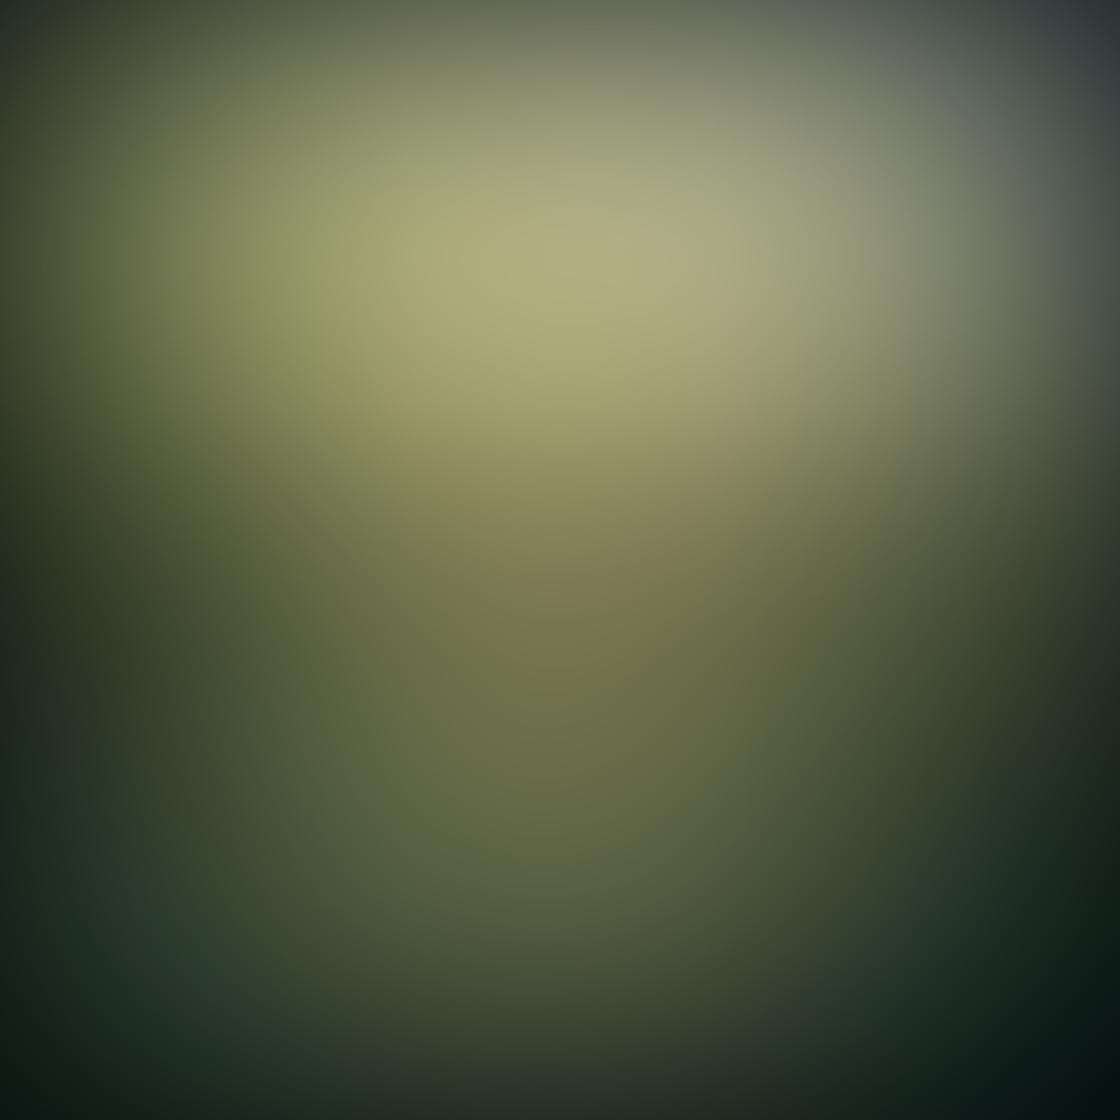 iPhone Reflection Photo 10